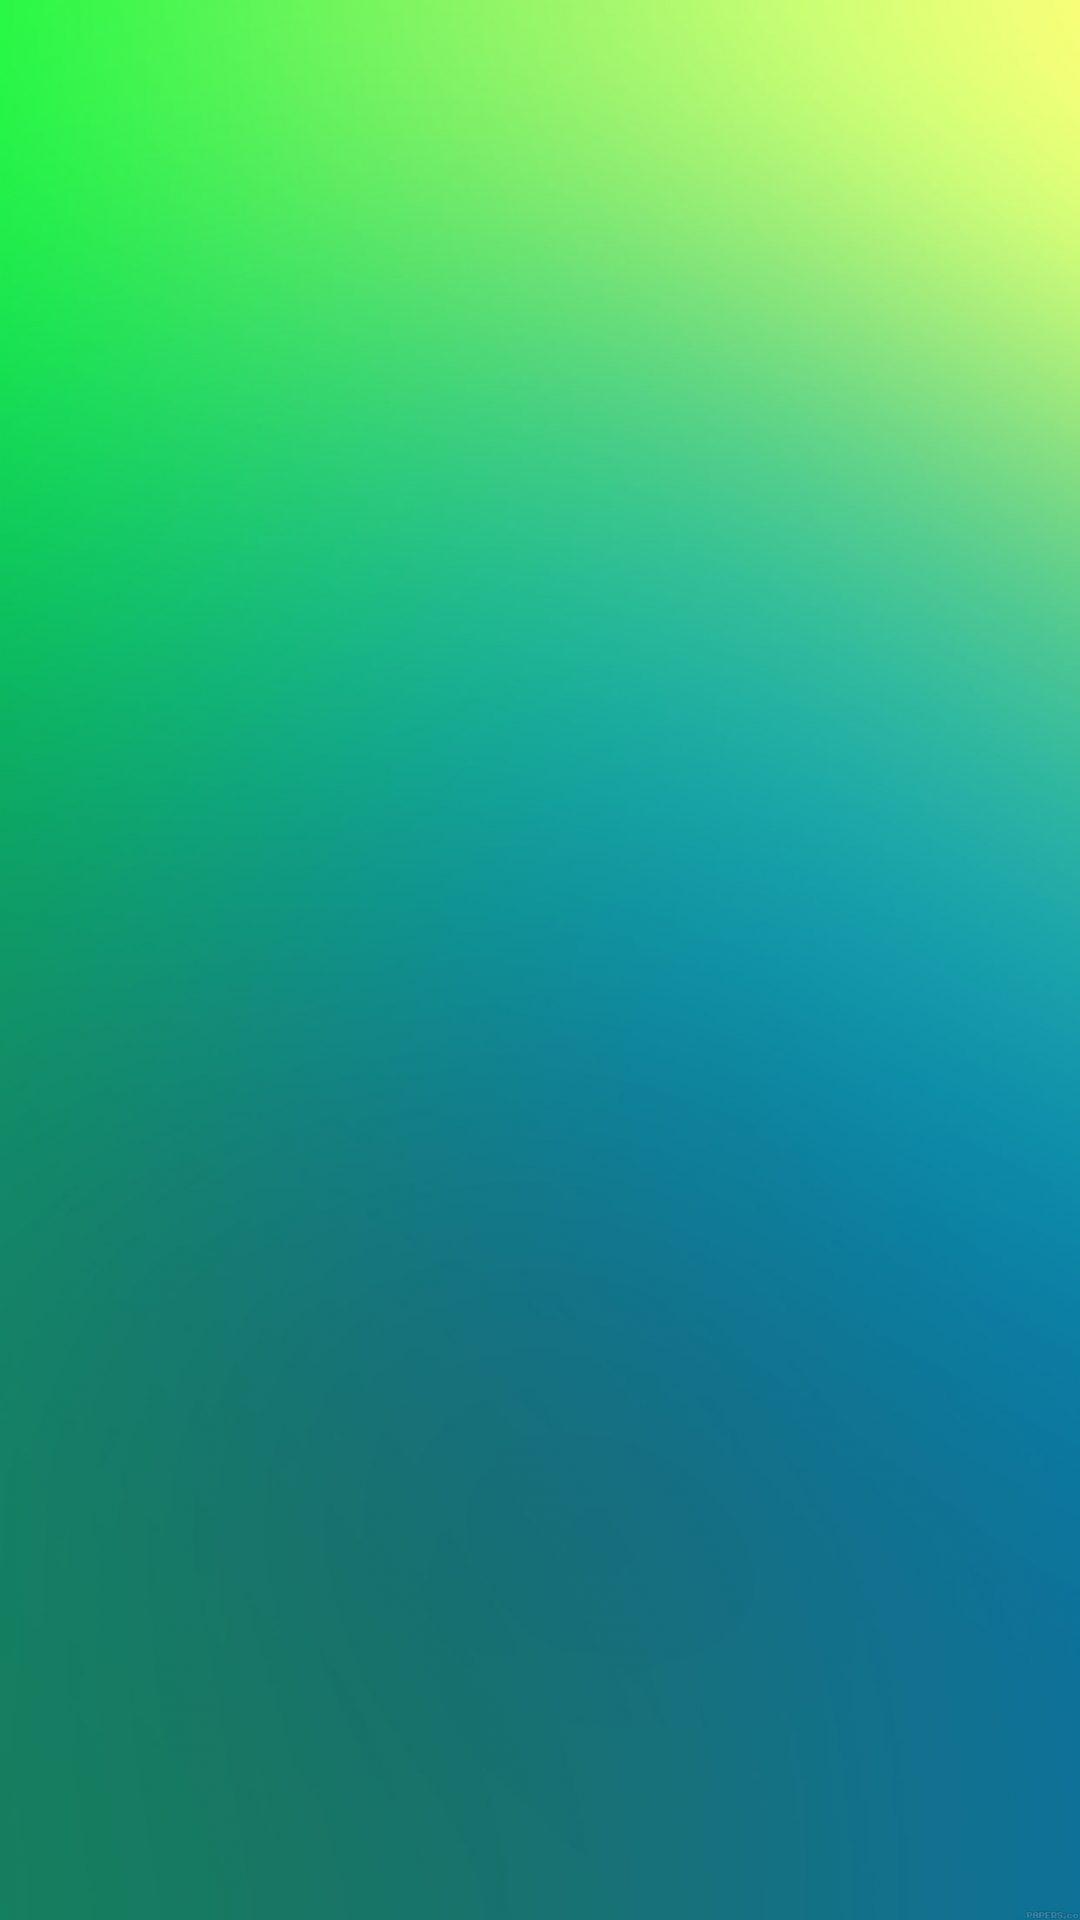 Green Apple Blue Yellow Blur